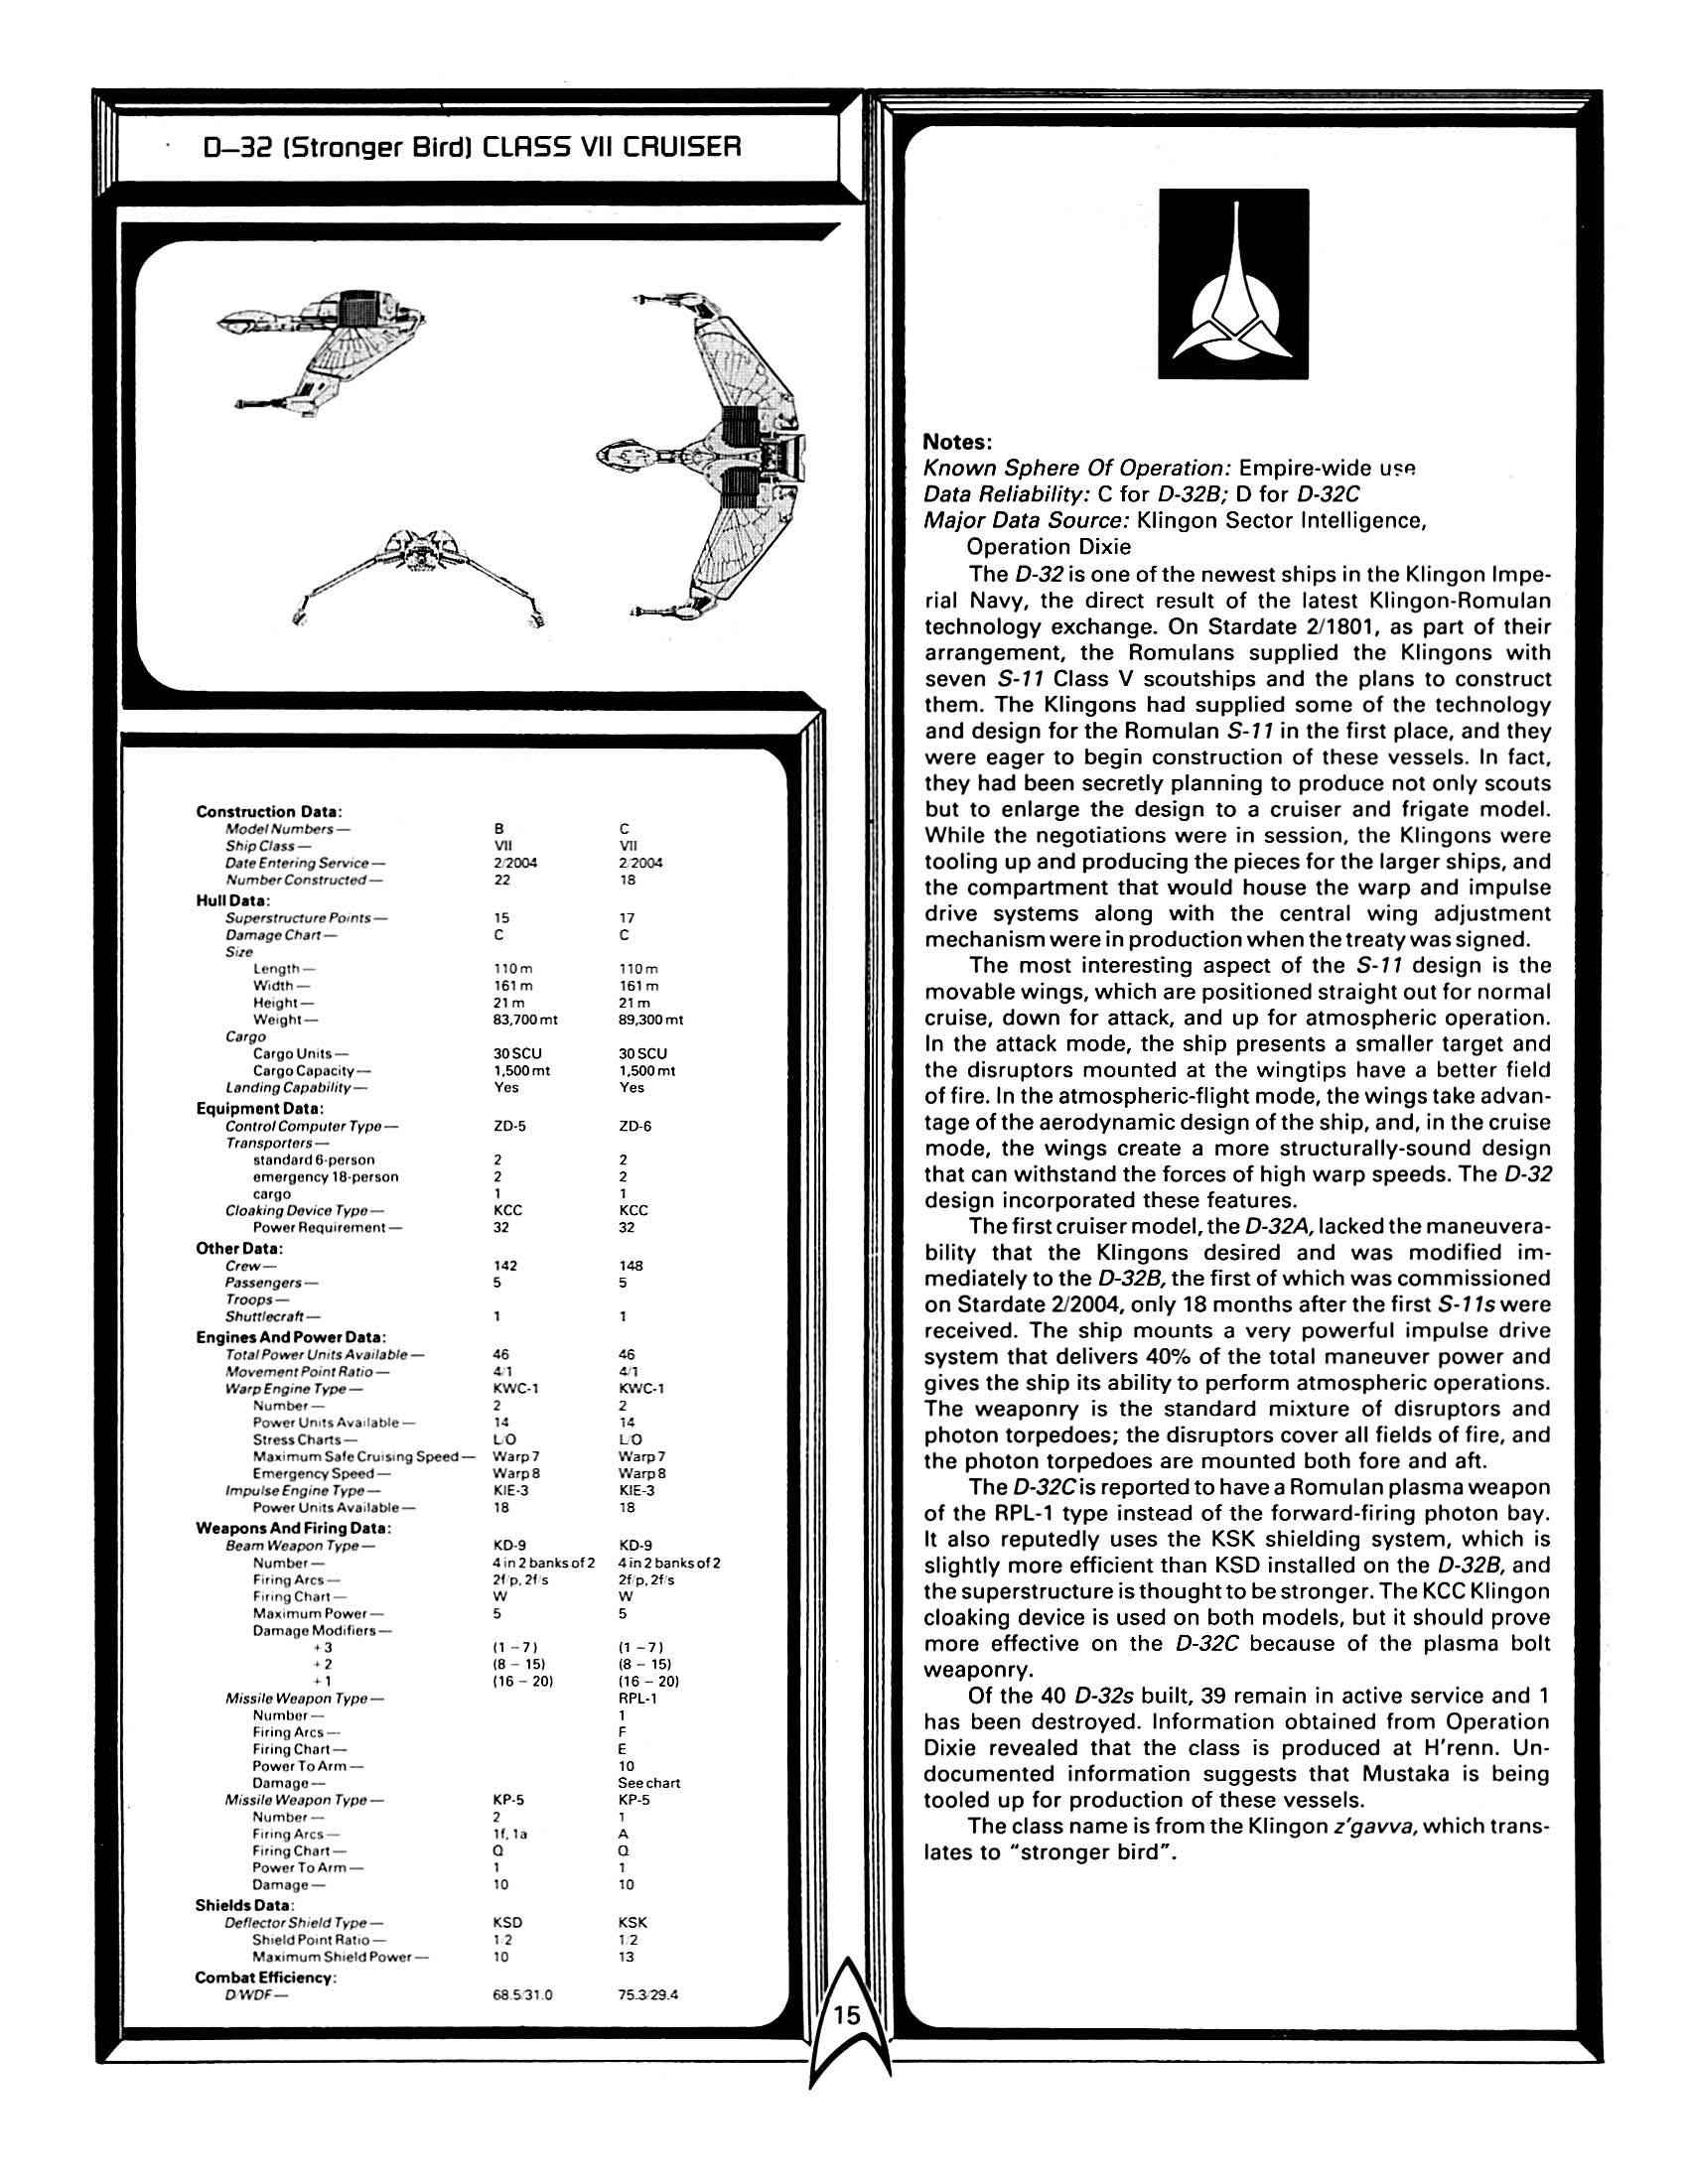 Star Trek Blueprints: FASA Klingon Ship Recognition Manual